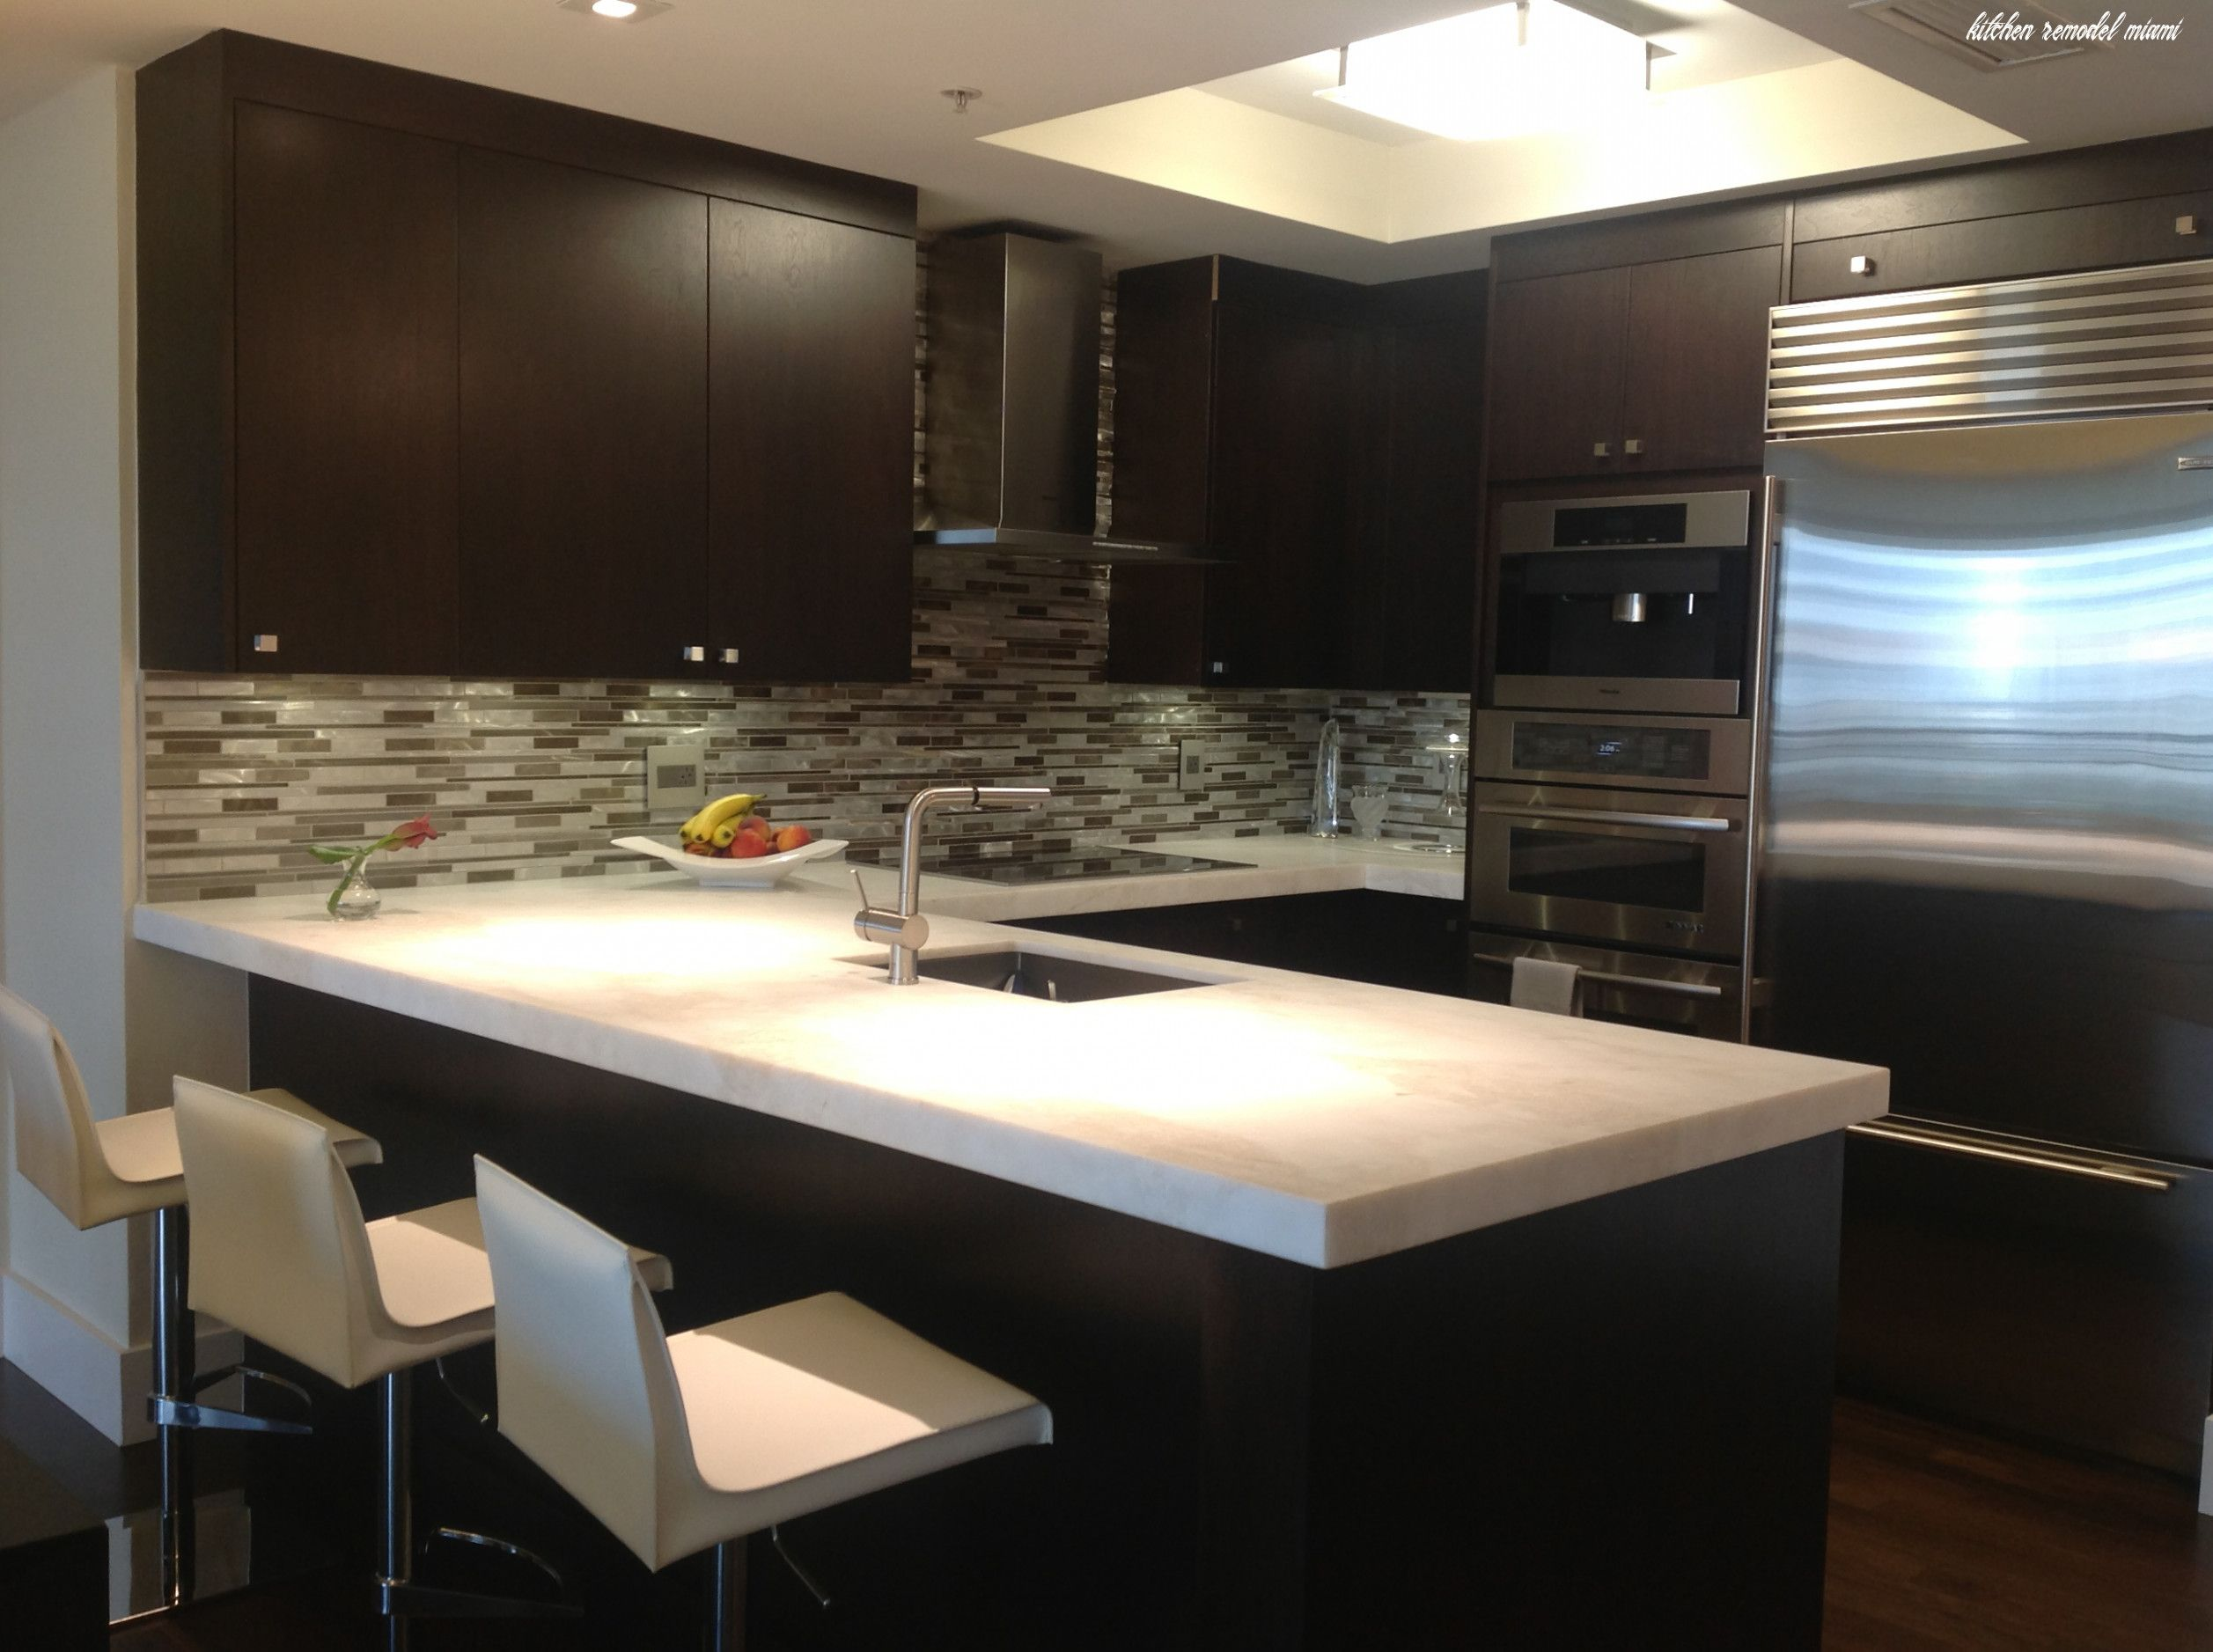 Kitchen Remodel Miami In 2020 Simple Kitchen Design Custom Kitchen Cabinets Design Luxury Kitchen Cabinets